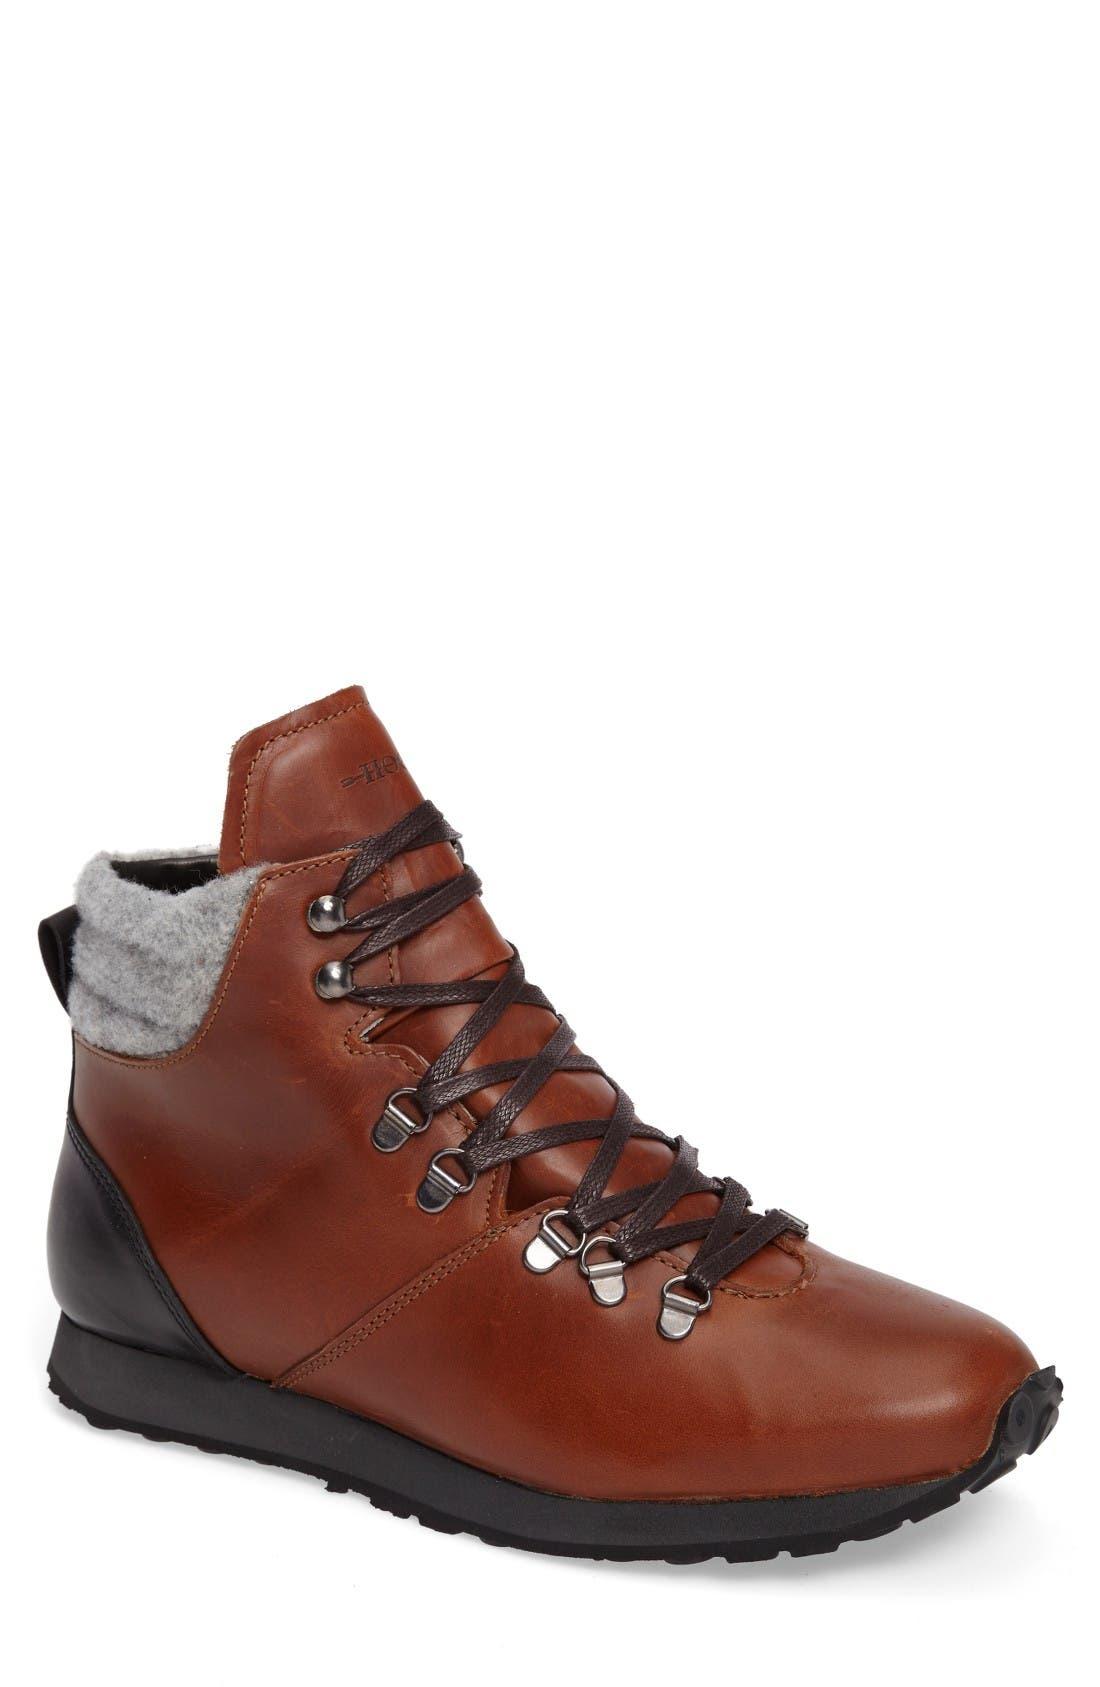 Main Image - Hood Rubber Concord Mid Top Wool Cuffed Waterproof Boot (Men)